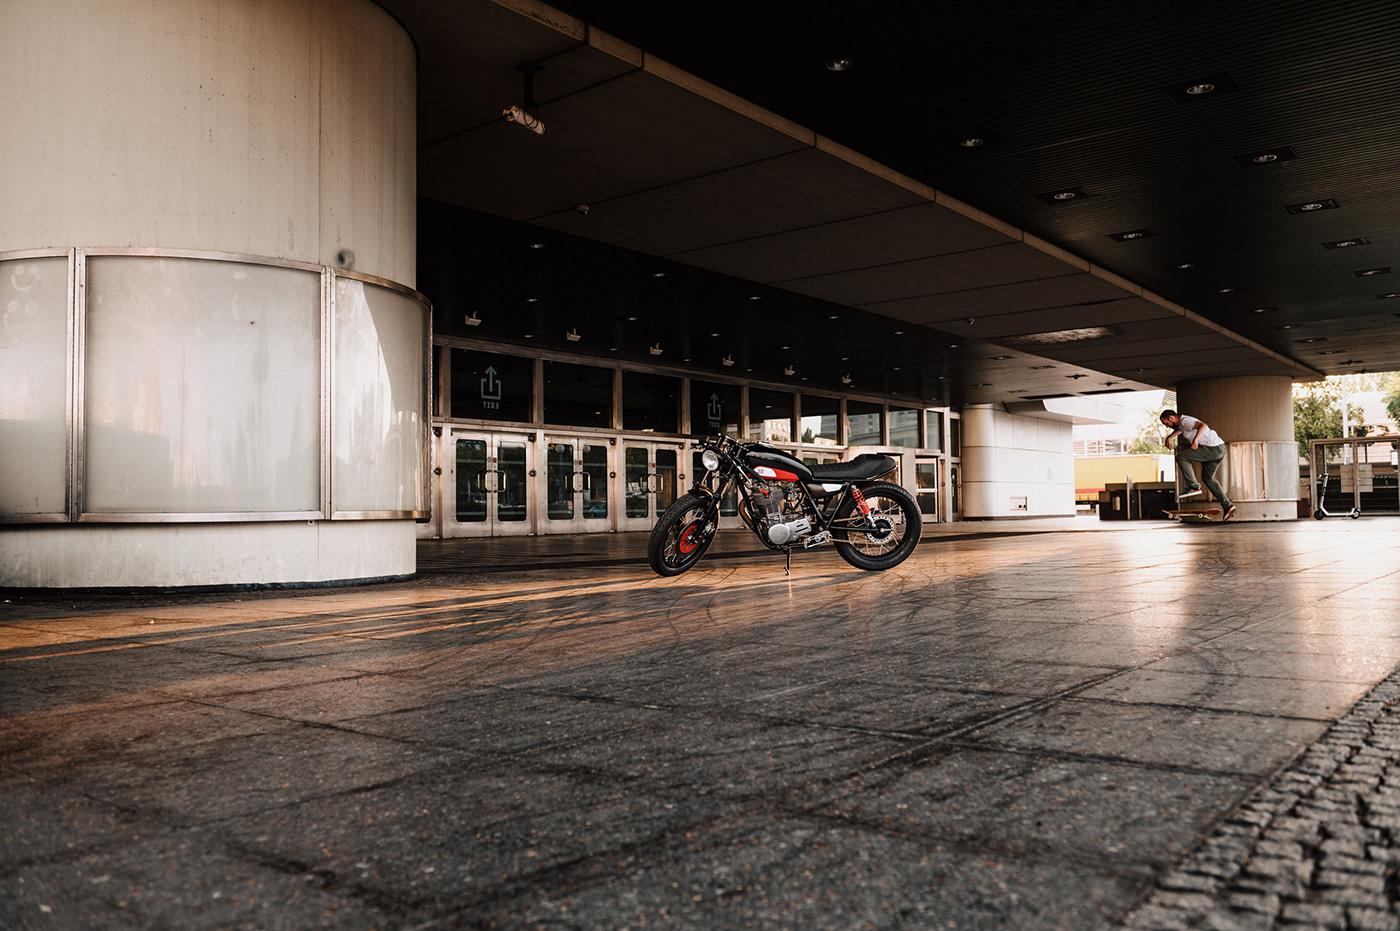 caferacer Custom custombike motorcycle motorcycle design sr500 yamaha